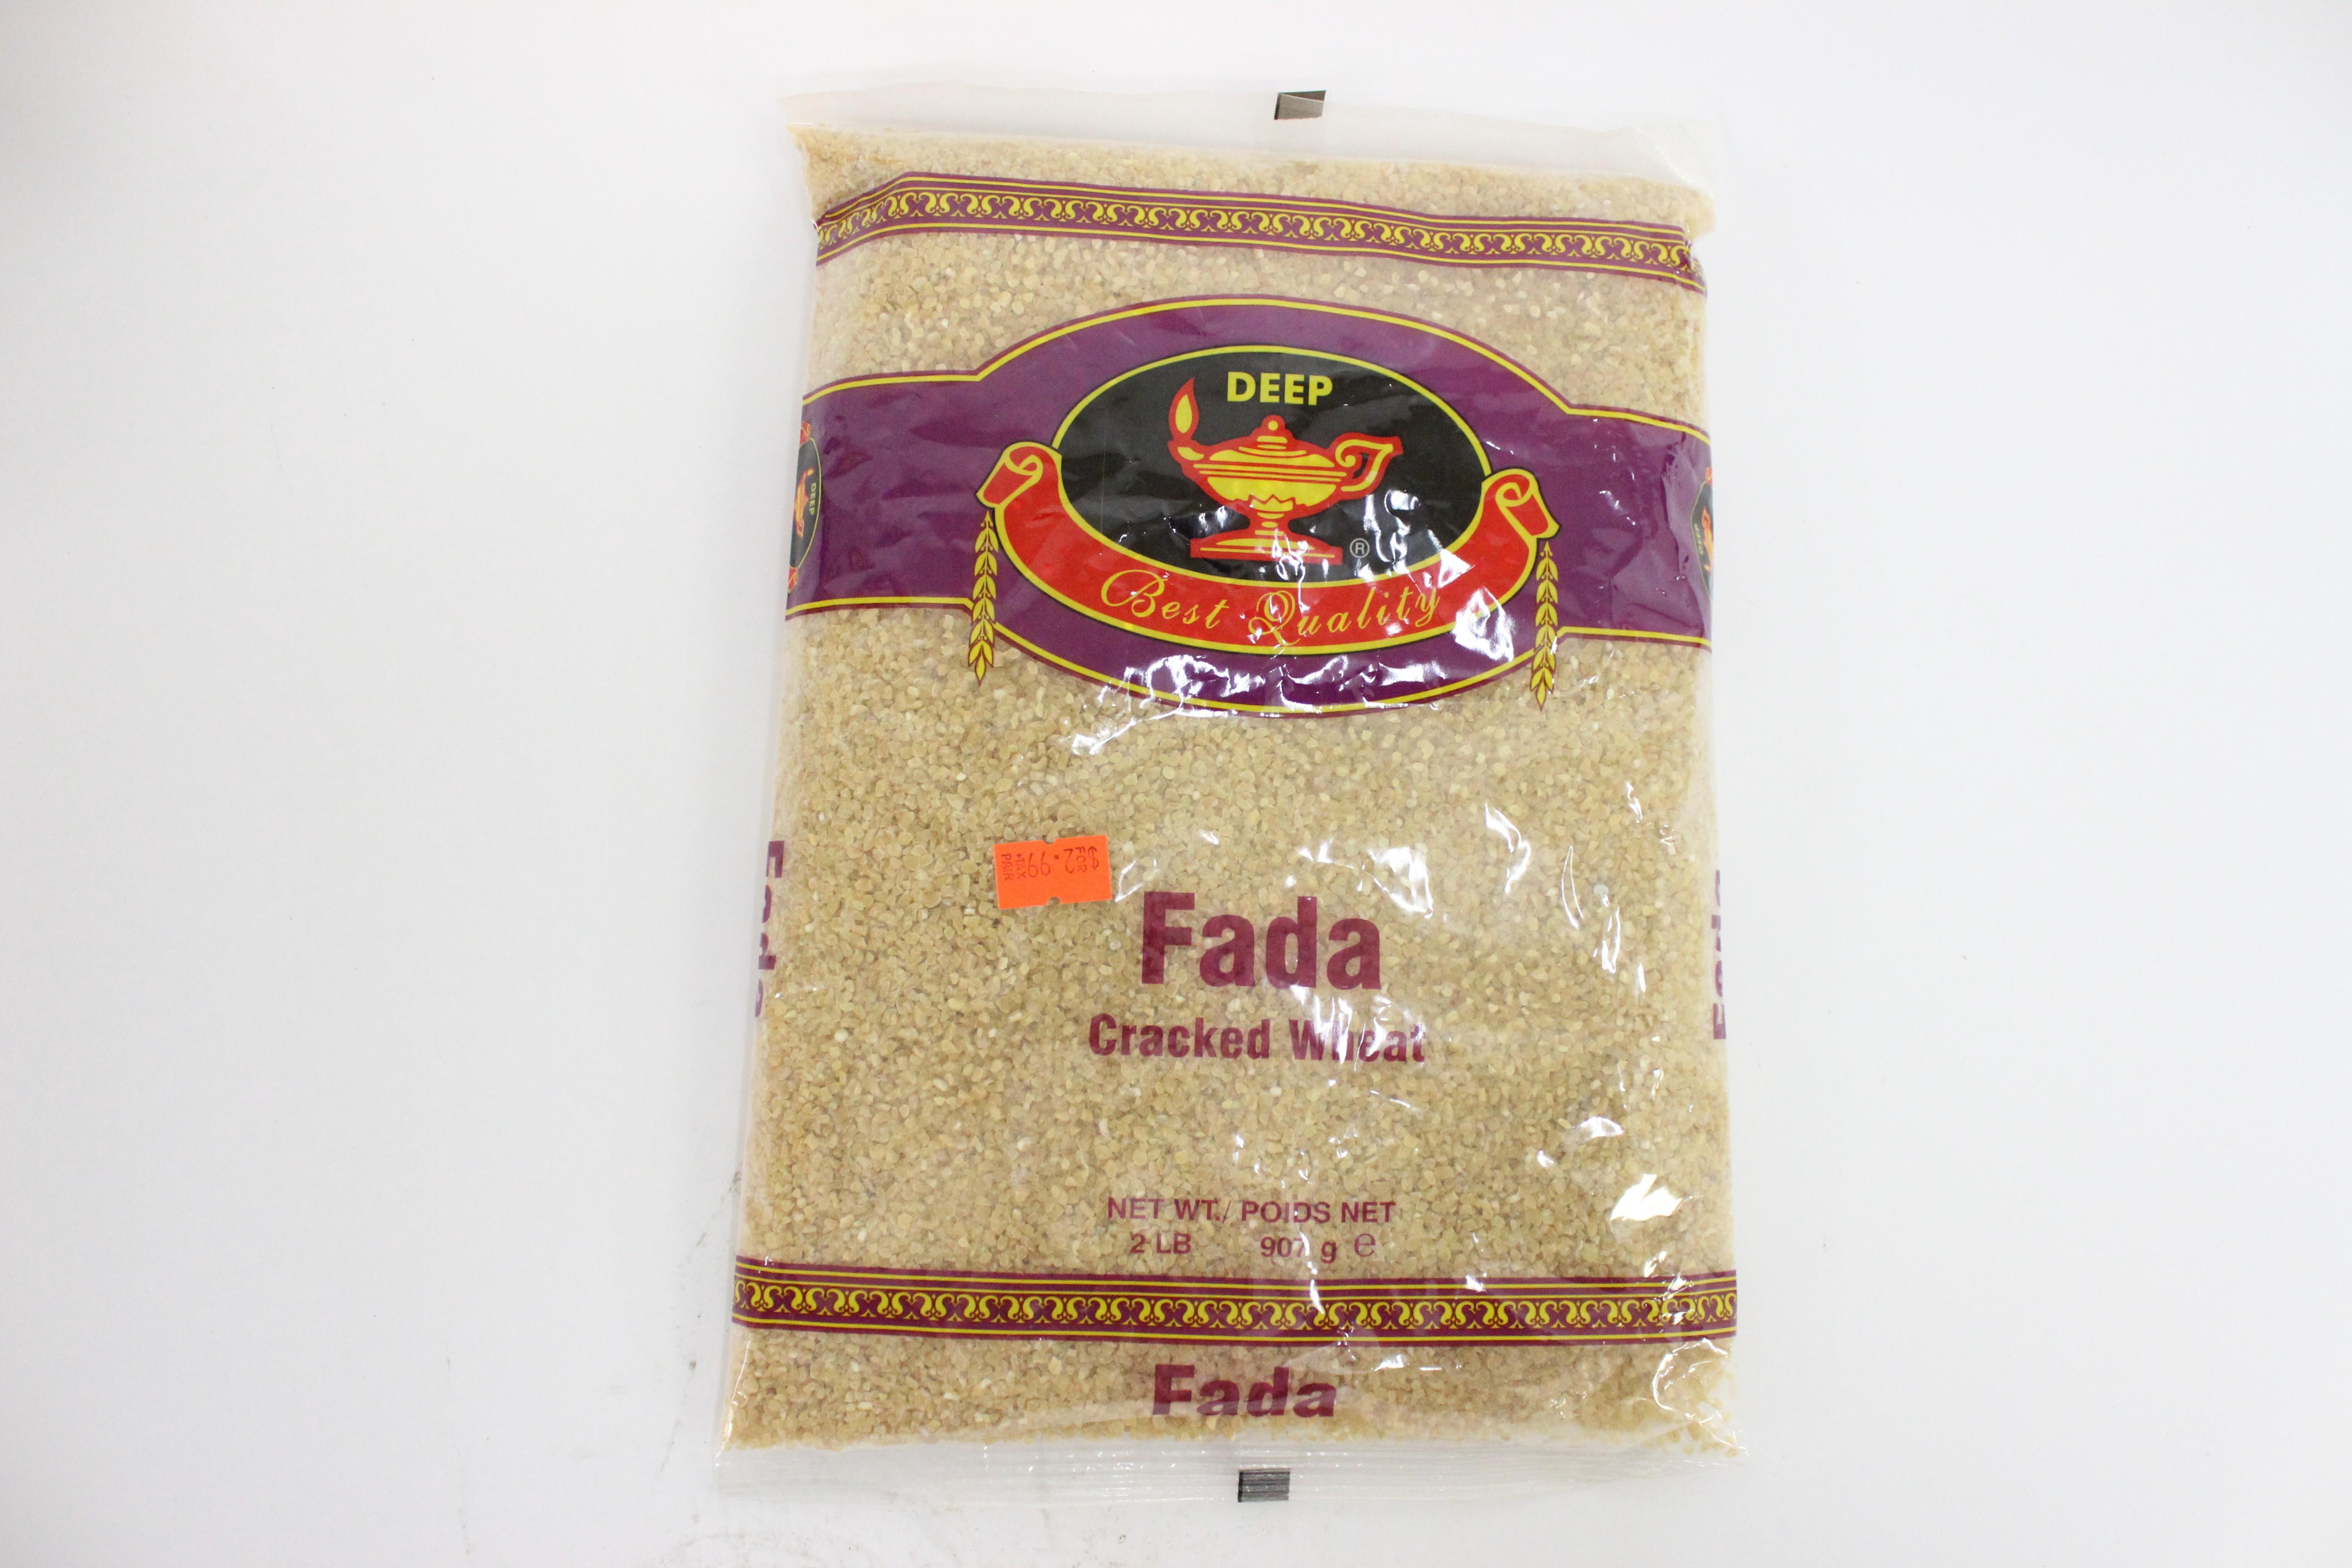 Fada Cracked Wheat 4 lbs